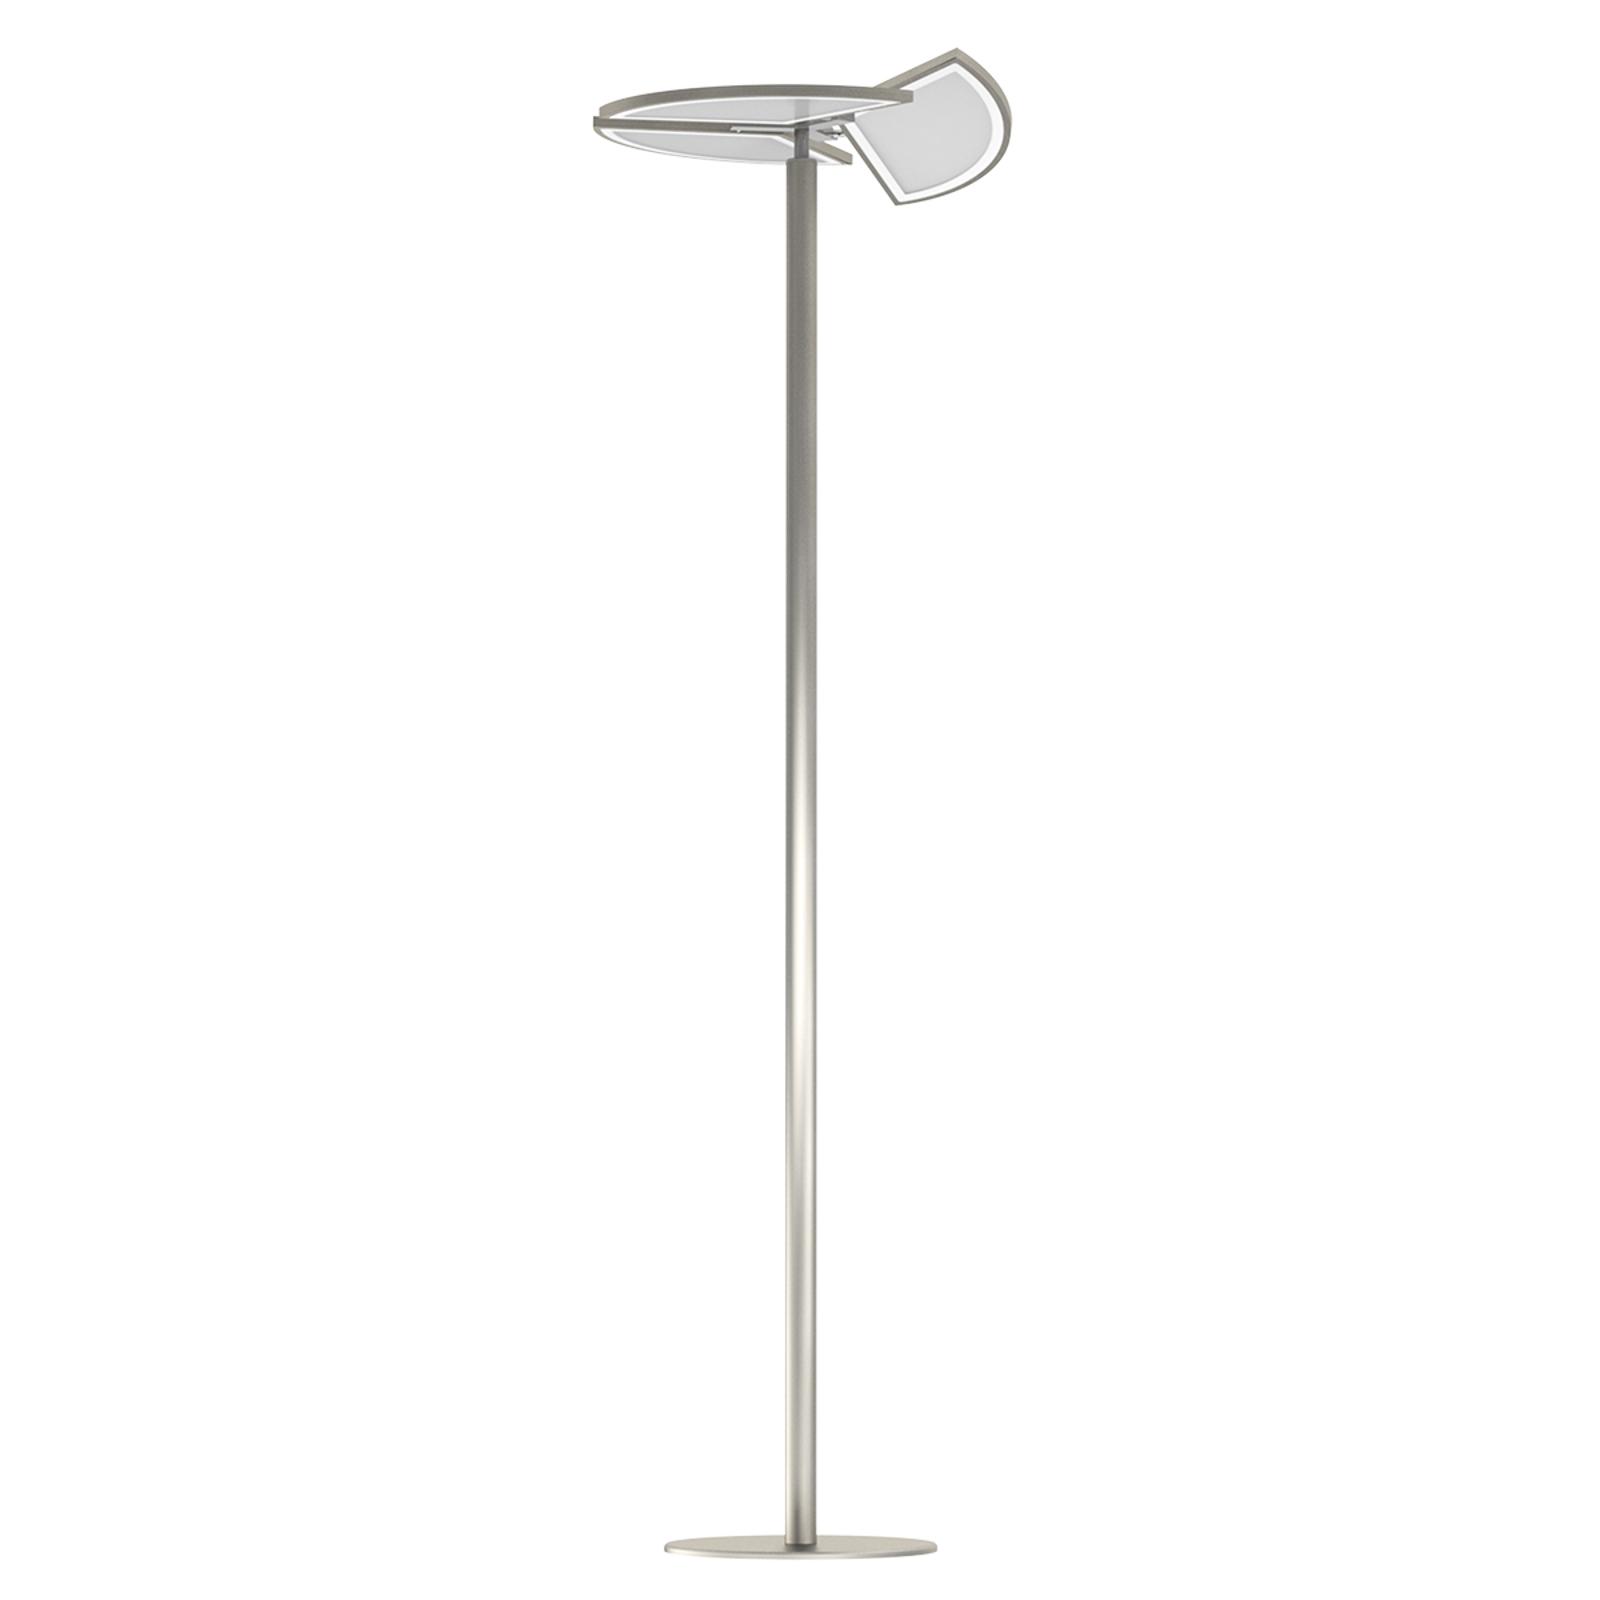 Topmoderná stojaca LED lampa Movil s Color Control_3025226_1